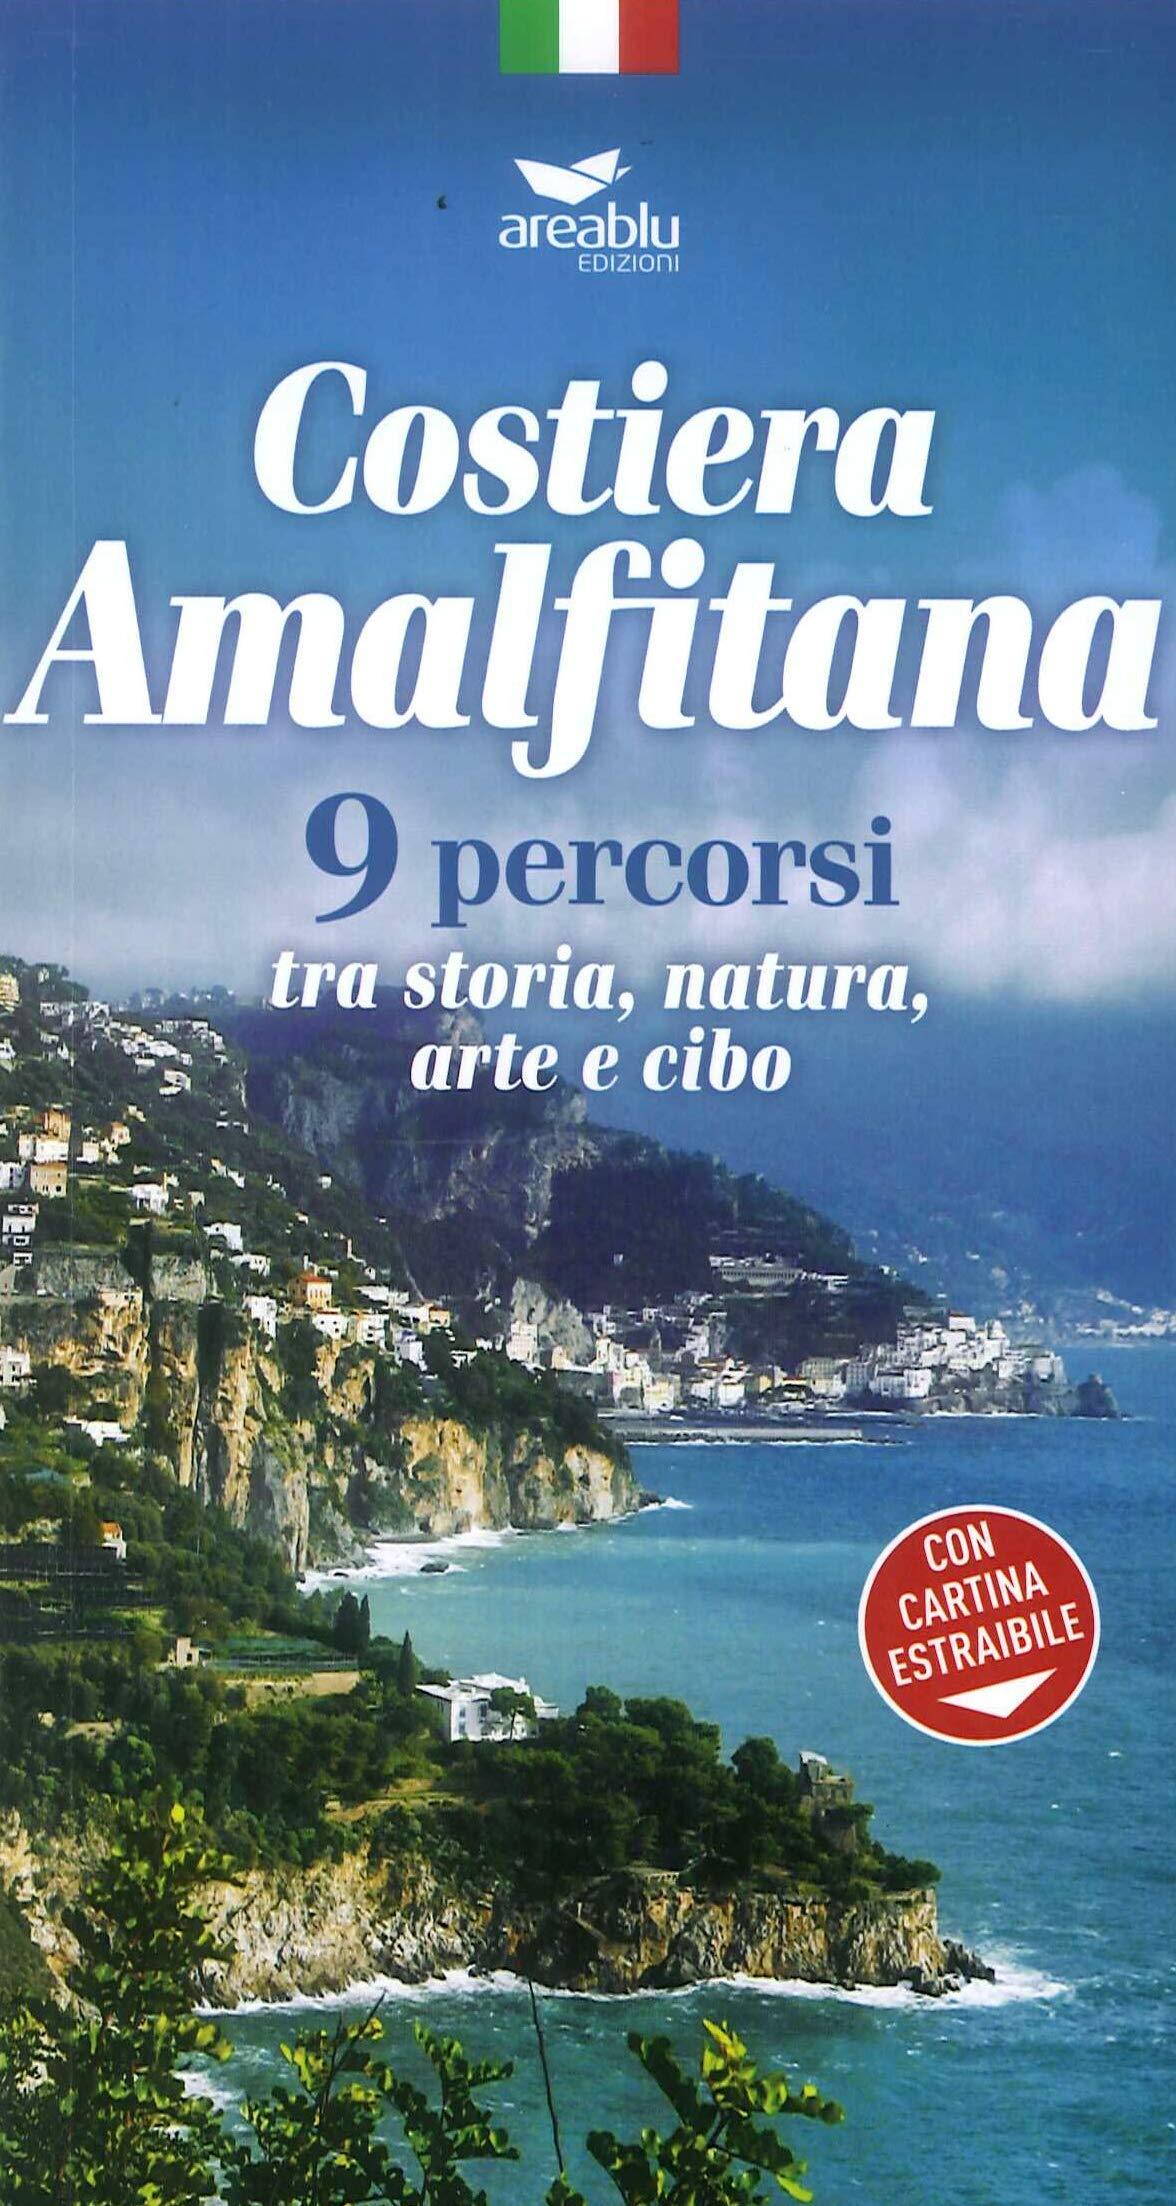 Cartina Geografica Della Costiera Amalfitana.Amazon It Costiera Amalfitana 9 Percorsi Tra Storia Natura